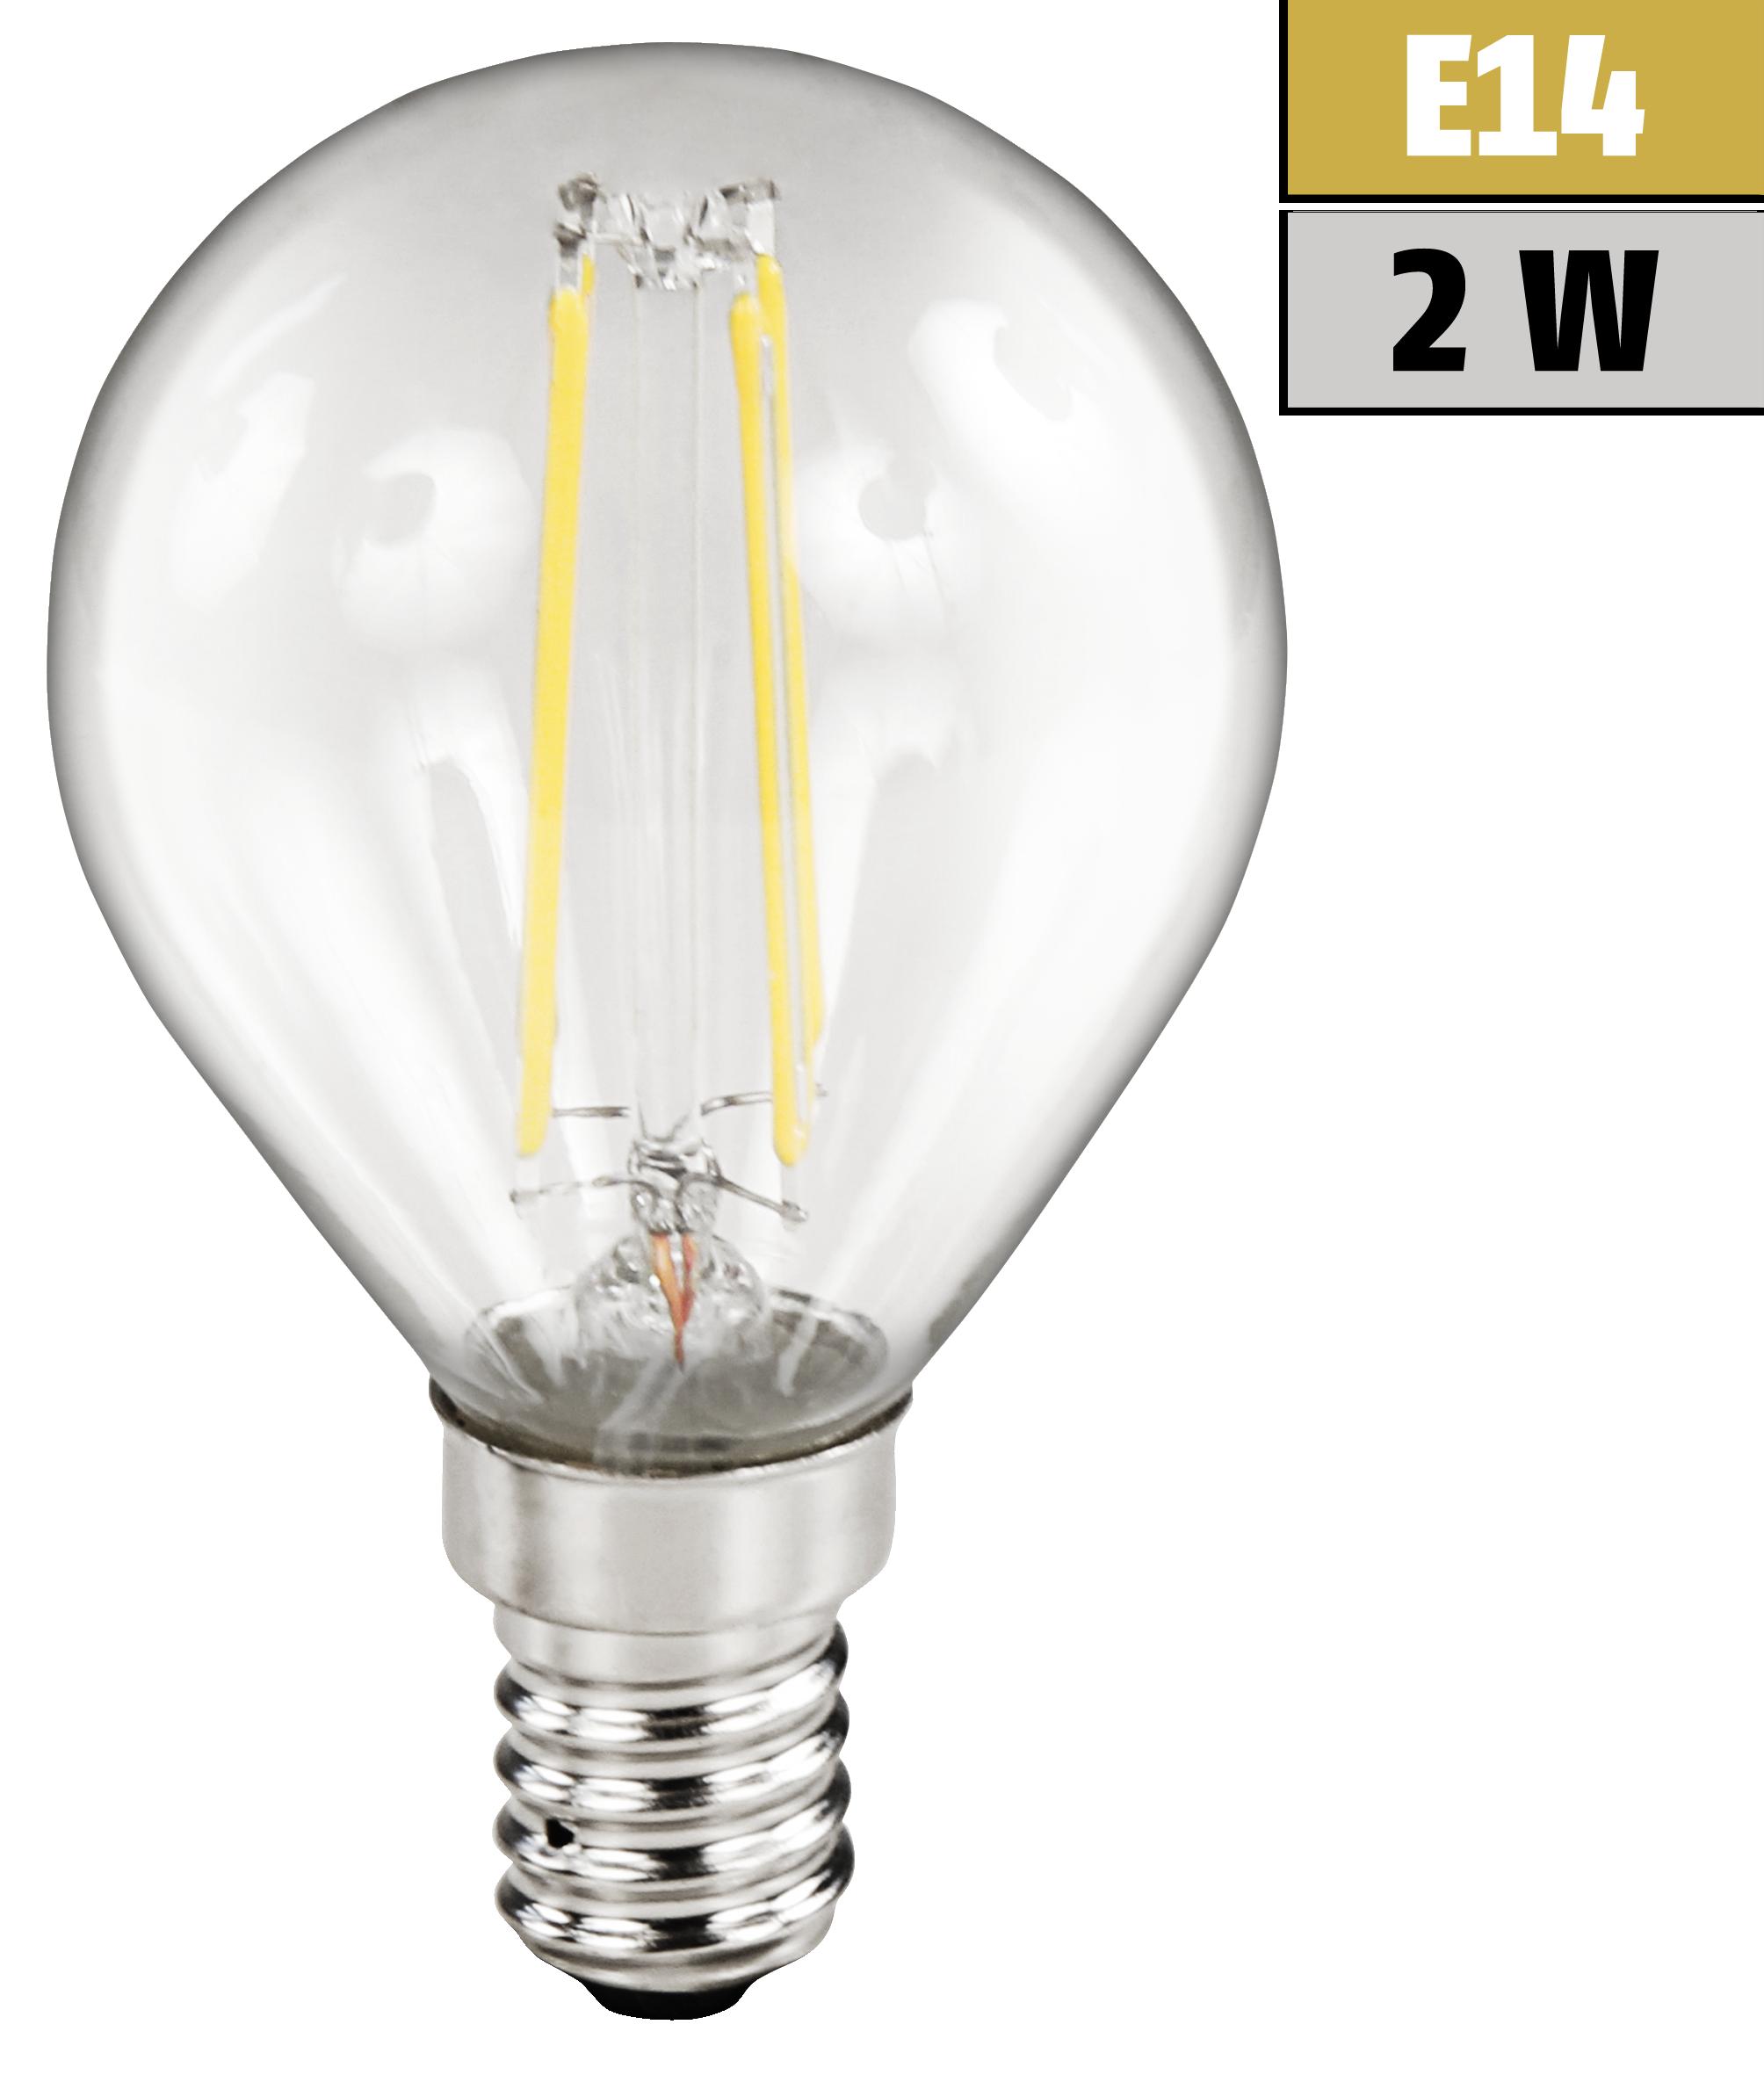 LED Filament Tropfenlampe McShine ''Filed'', E14, 2W, 200 lm, warmweiß, klar